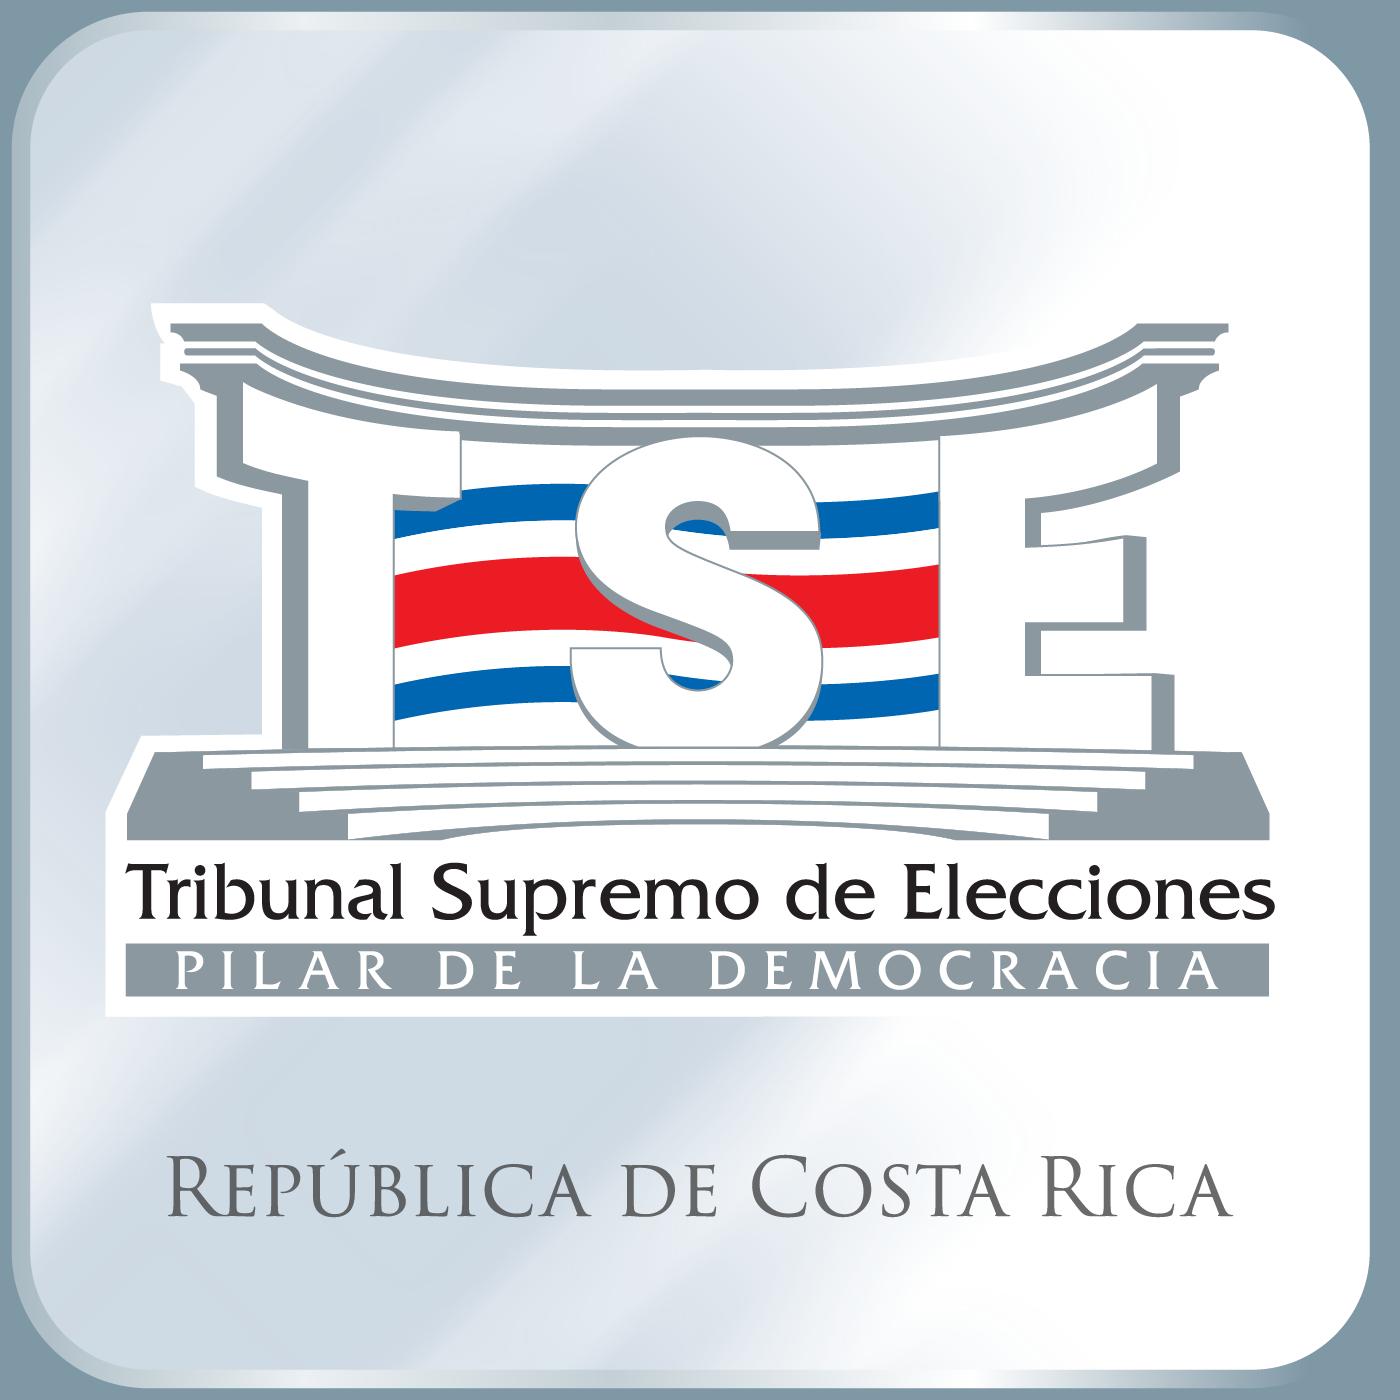 Tribunal Supremo de Elecciones - Costa Rica